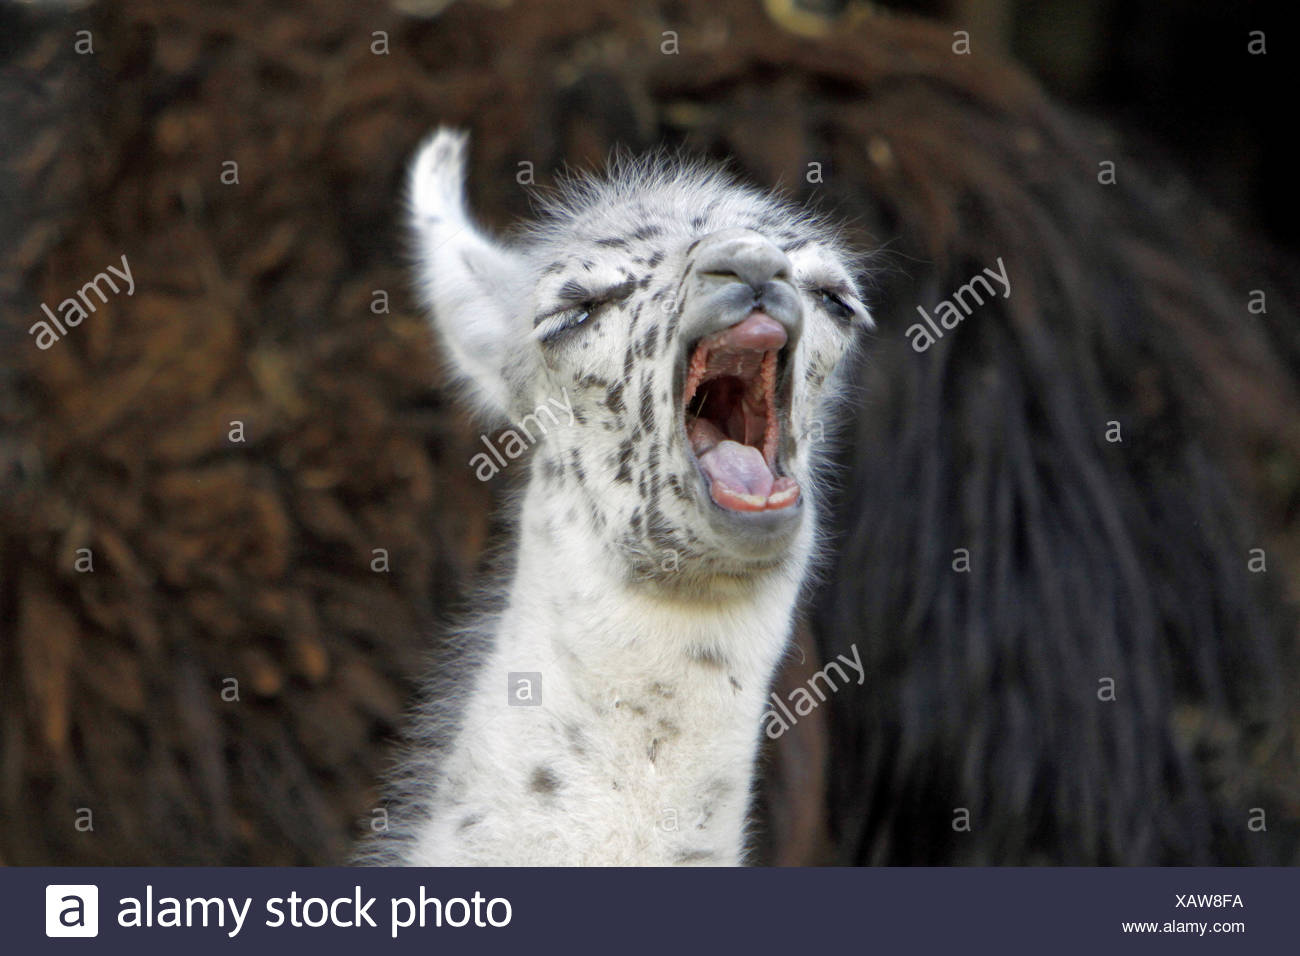 llama (Lama glama), portrait of a yawning pup - Stock Image